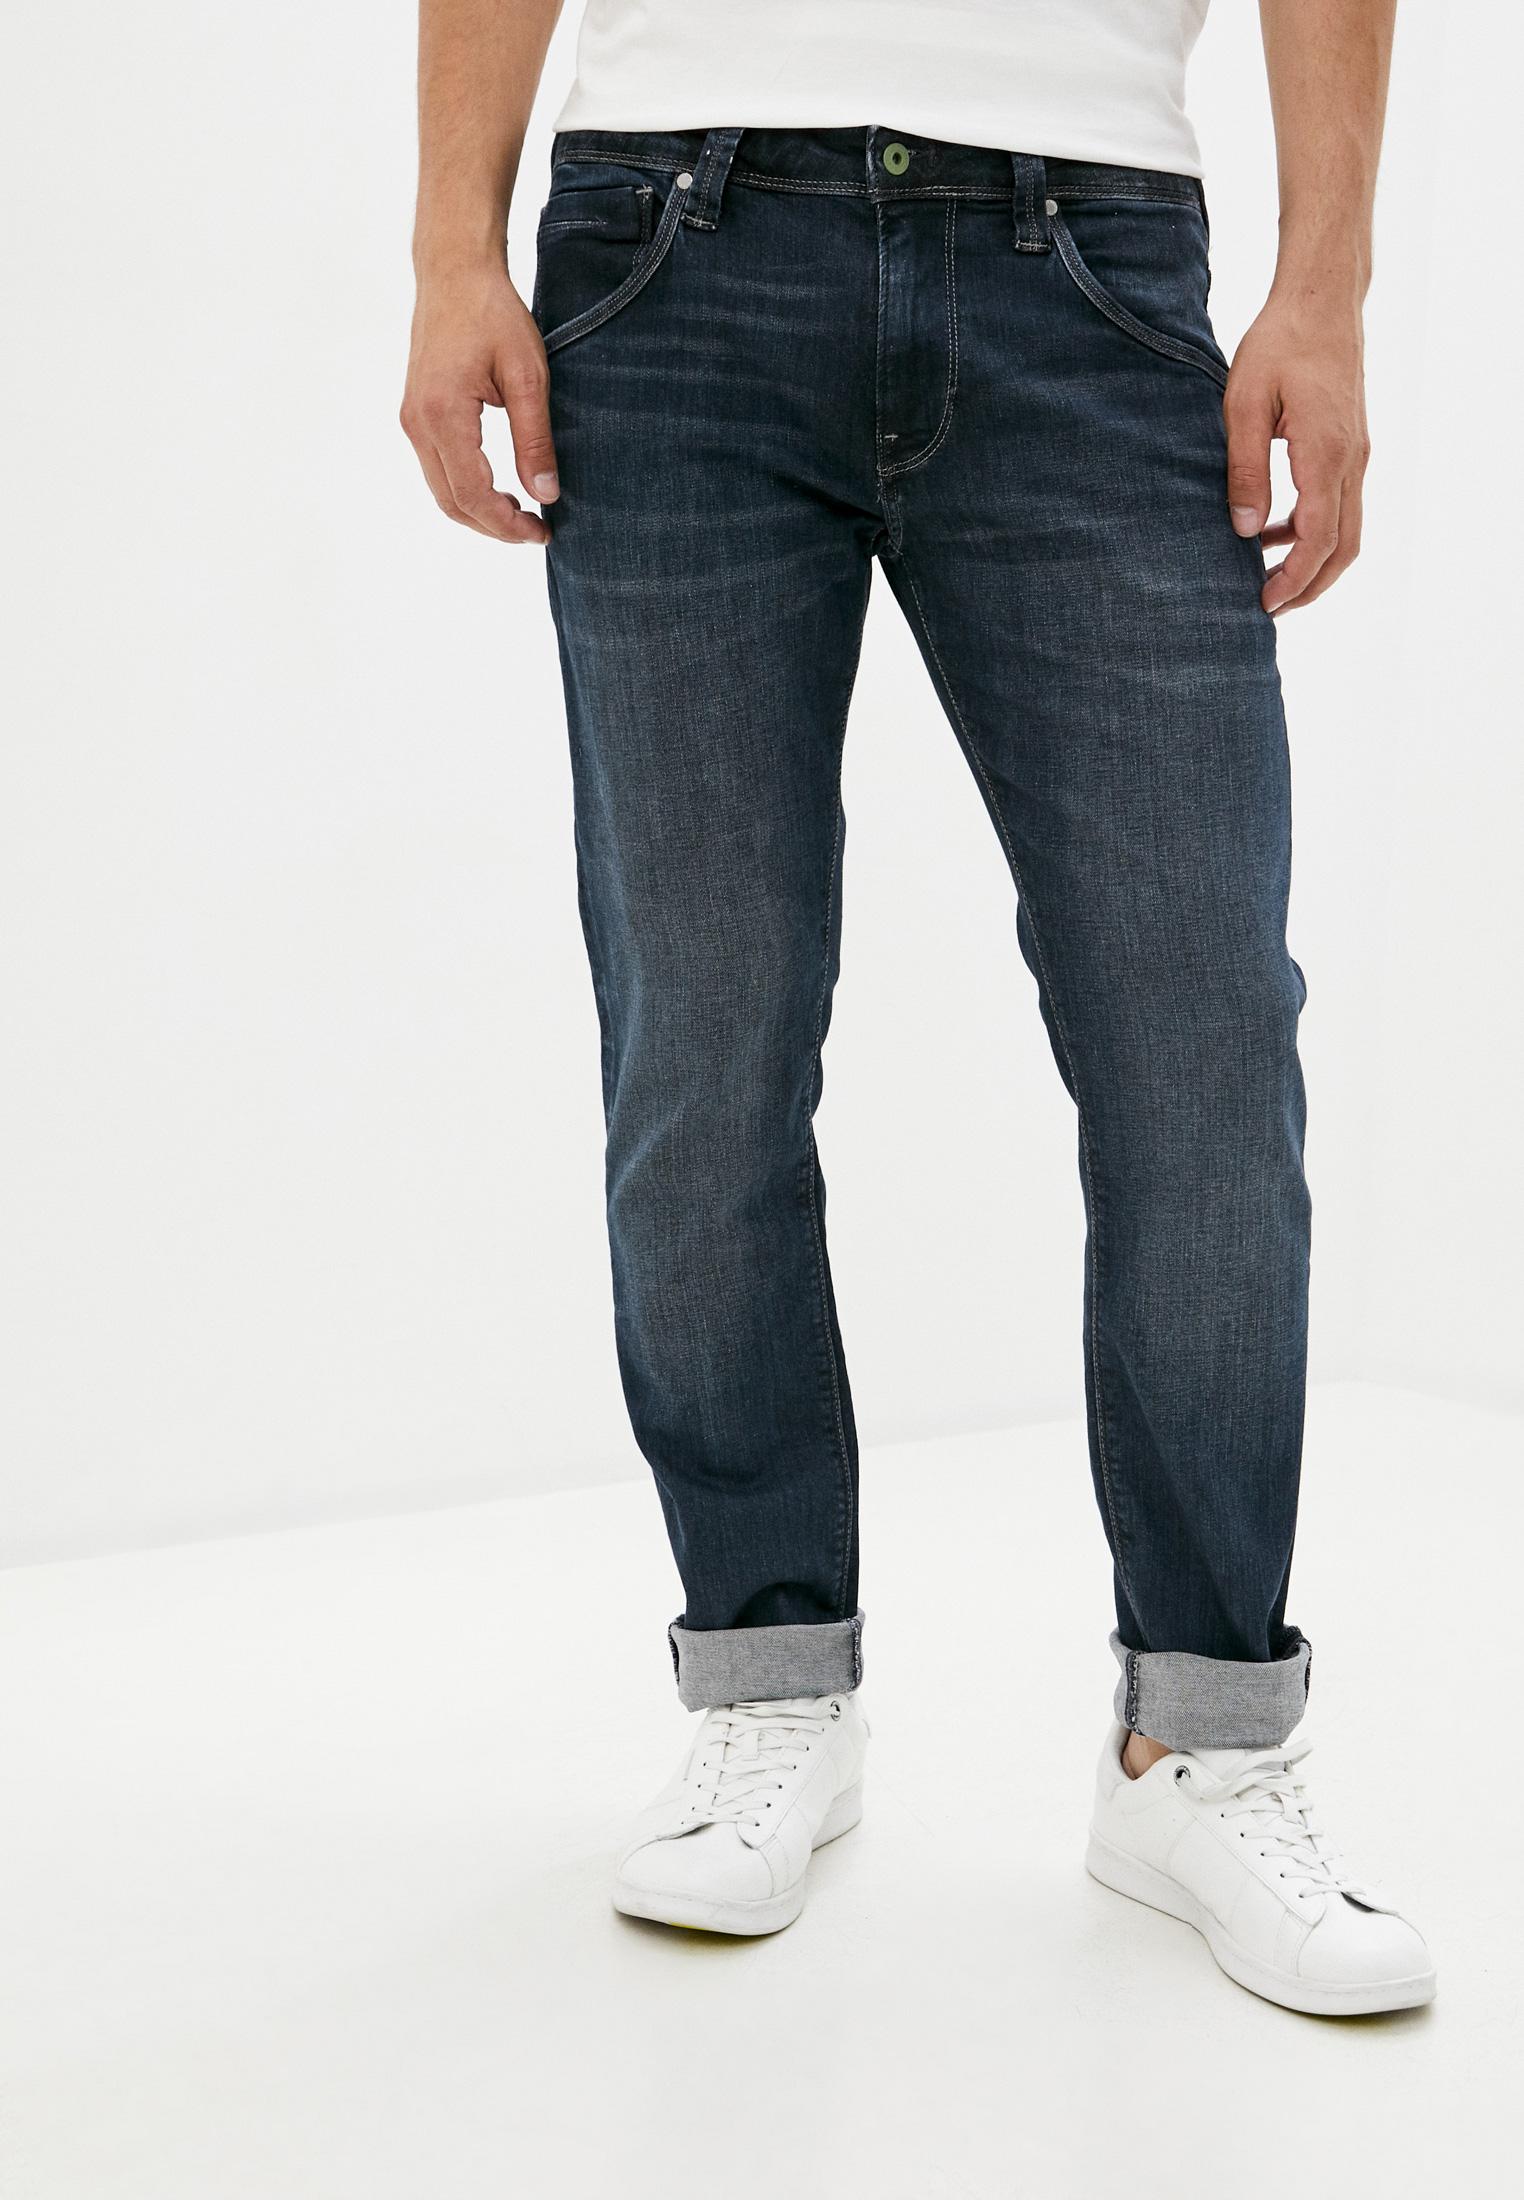 Зауженные джинсы Pepe Jeans (Пепе Джинс) PM201519WP5